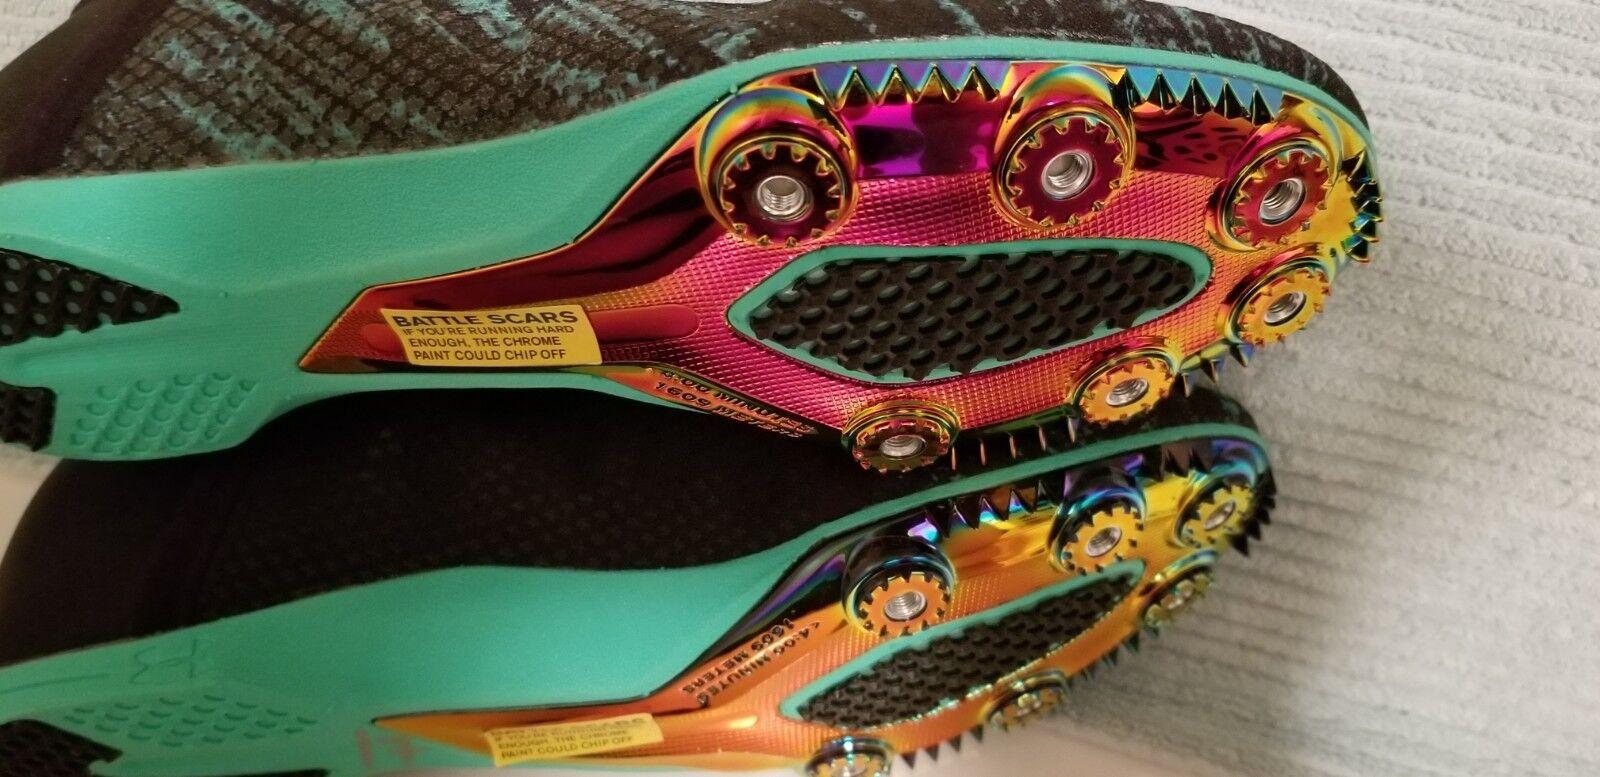 NWOT Rare Under Armour Armour Armour Speedform Miler Pro Spiked Track scarpe 1266204-299 Uomo 10 edb8ea